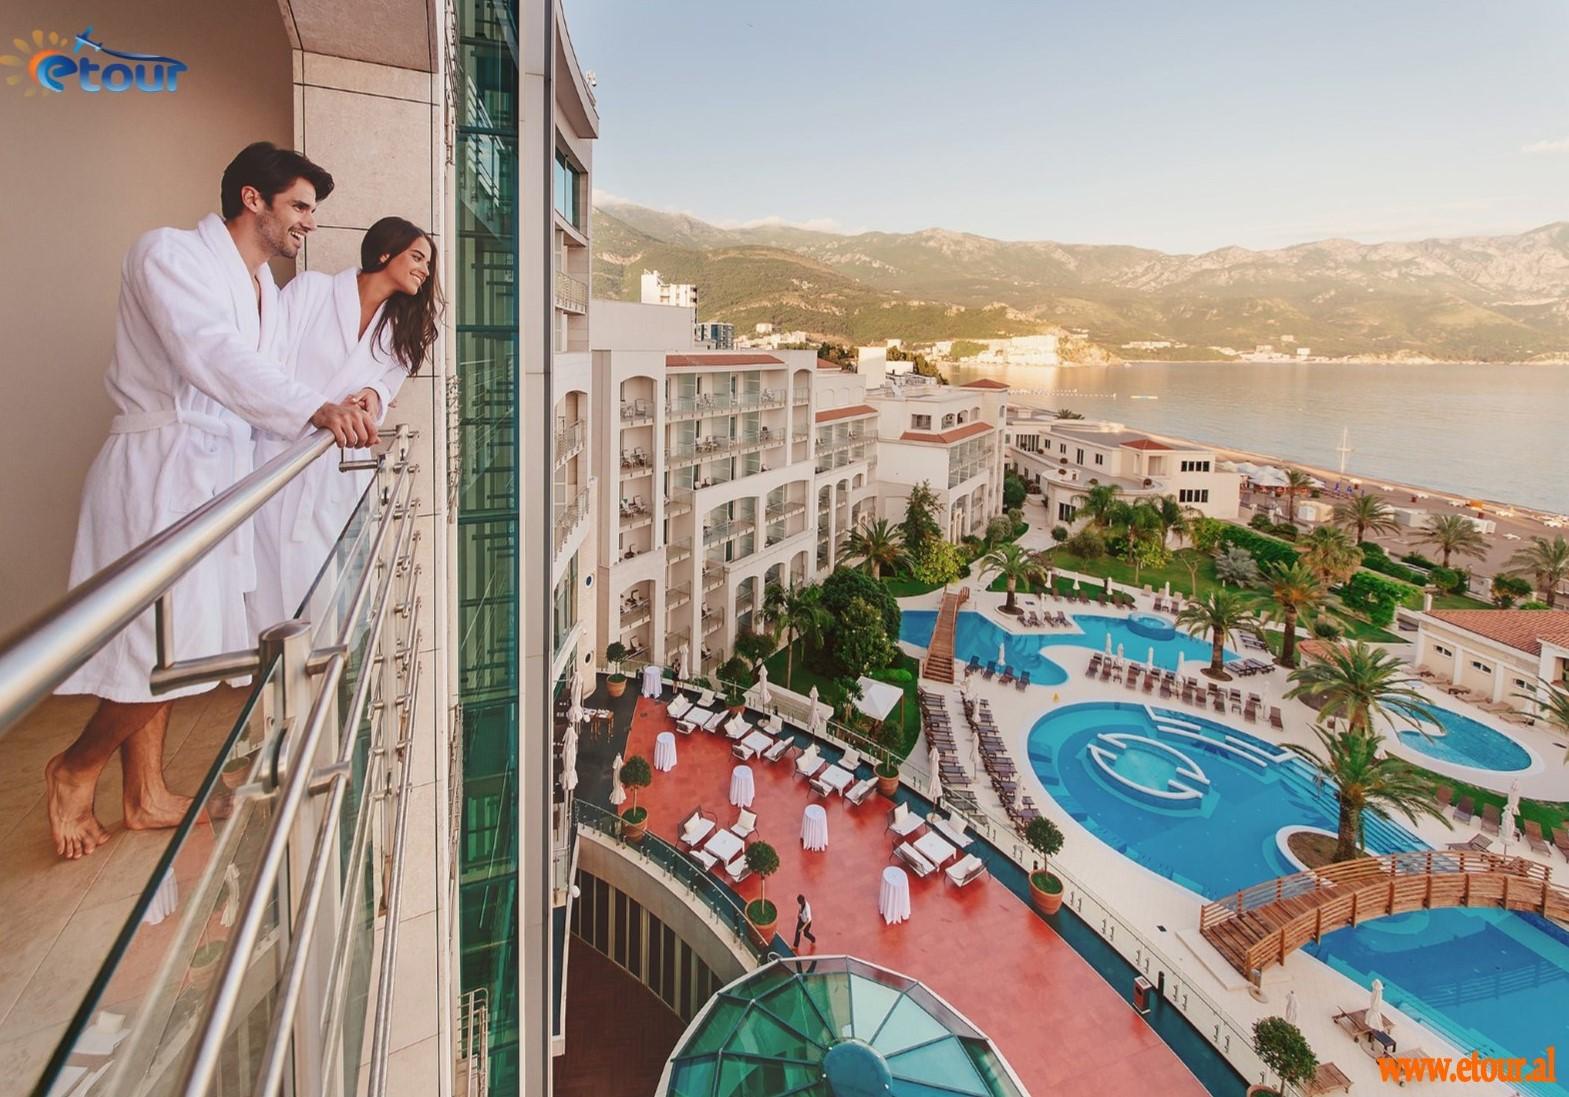 Splendid Hotel Conference & Spa Resort  - Mali Zi